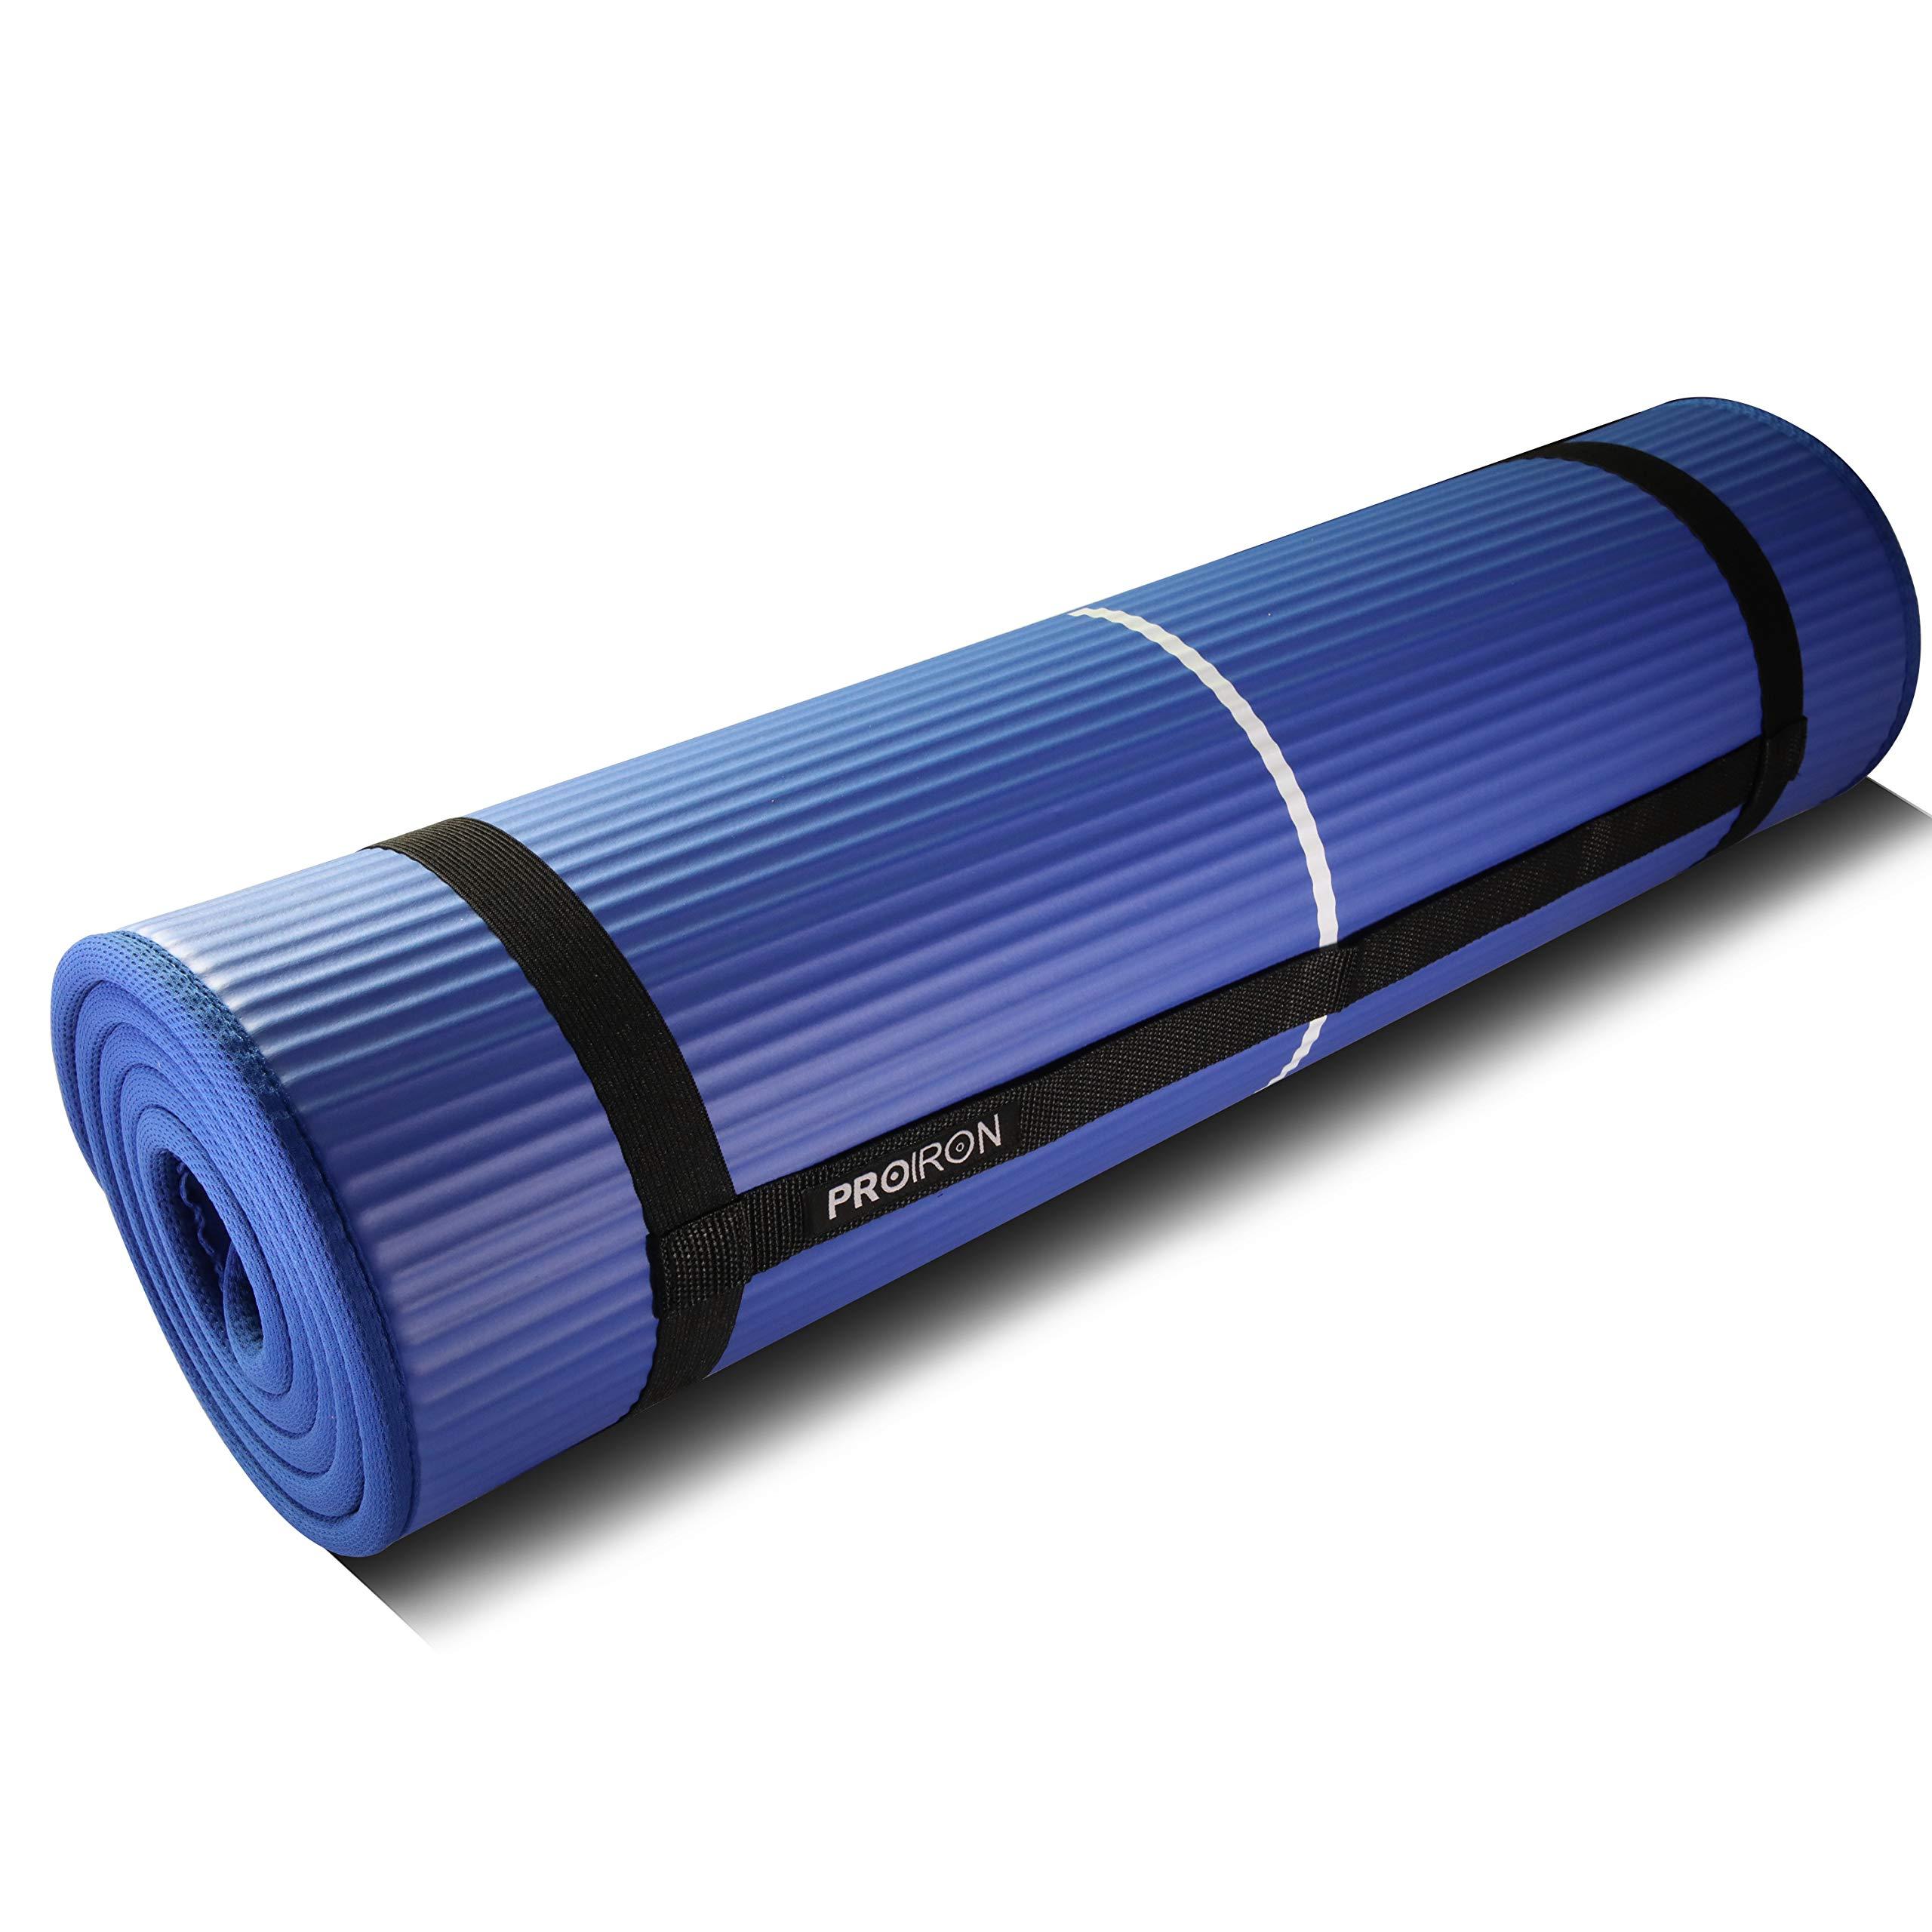 PROIRON Colchón para Yoga NBR Colchoneta Antideslizante Ideal para Pilates Ejercicios Fitness Gimnasia Estiramientos 183CM*66CM*1CM product image